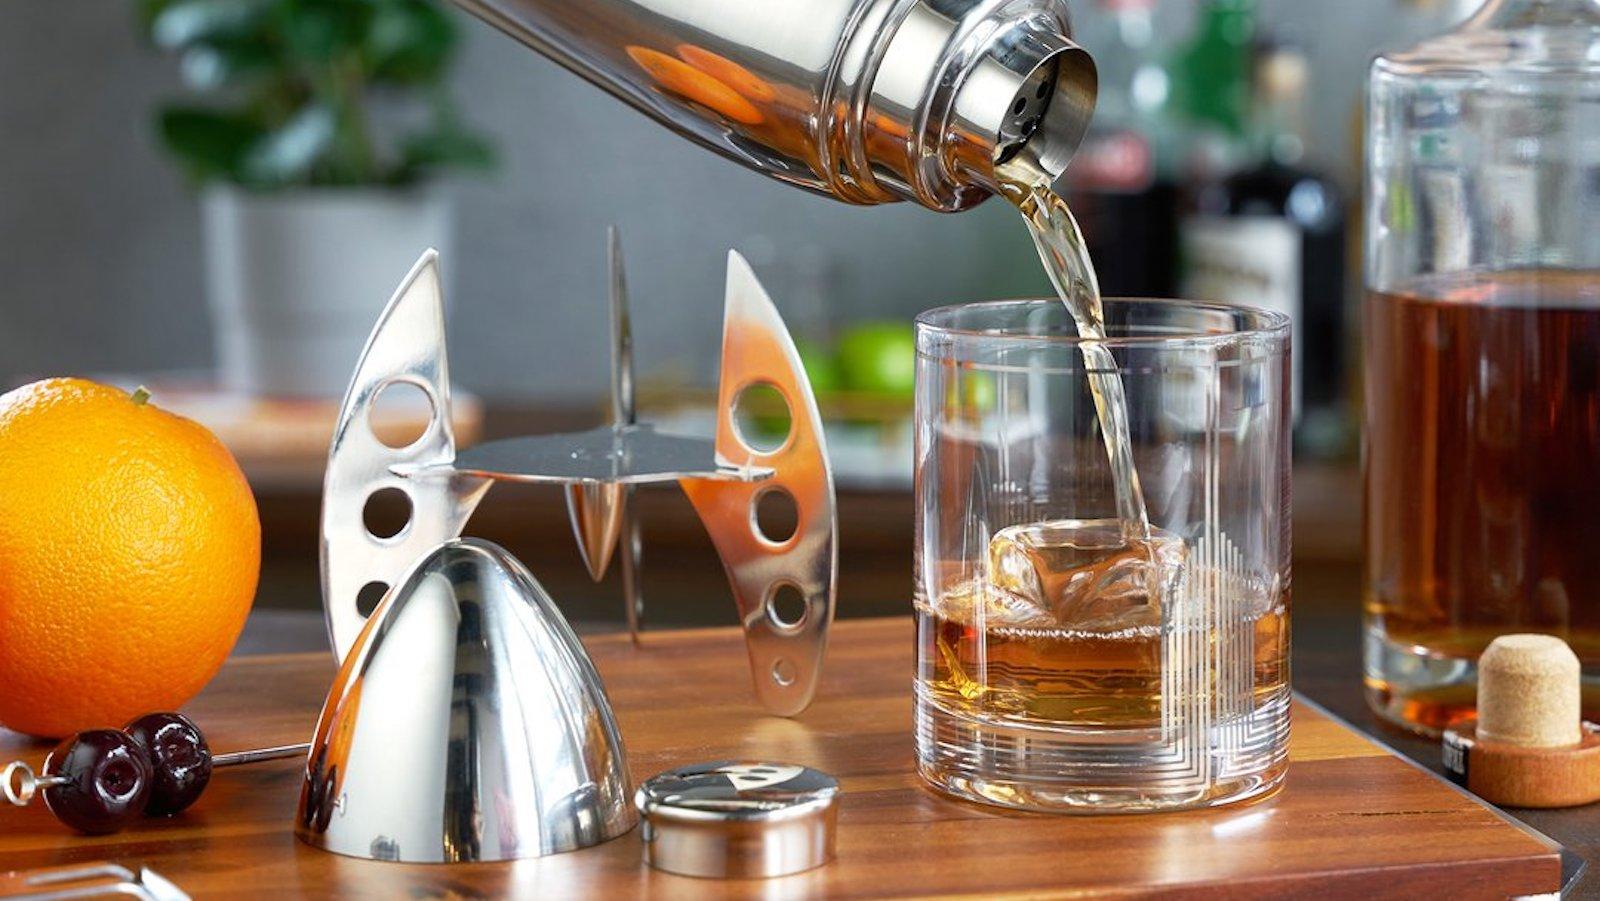 Viski Rocket Cocktail Shaker boasts a sleek, space worthy design made of stainless steel